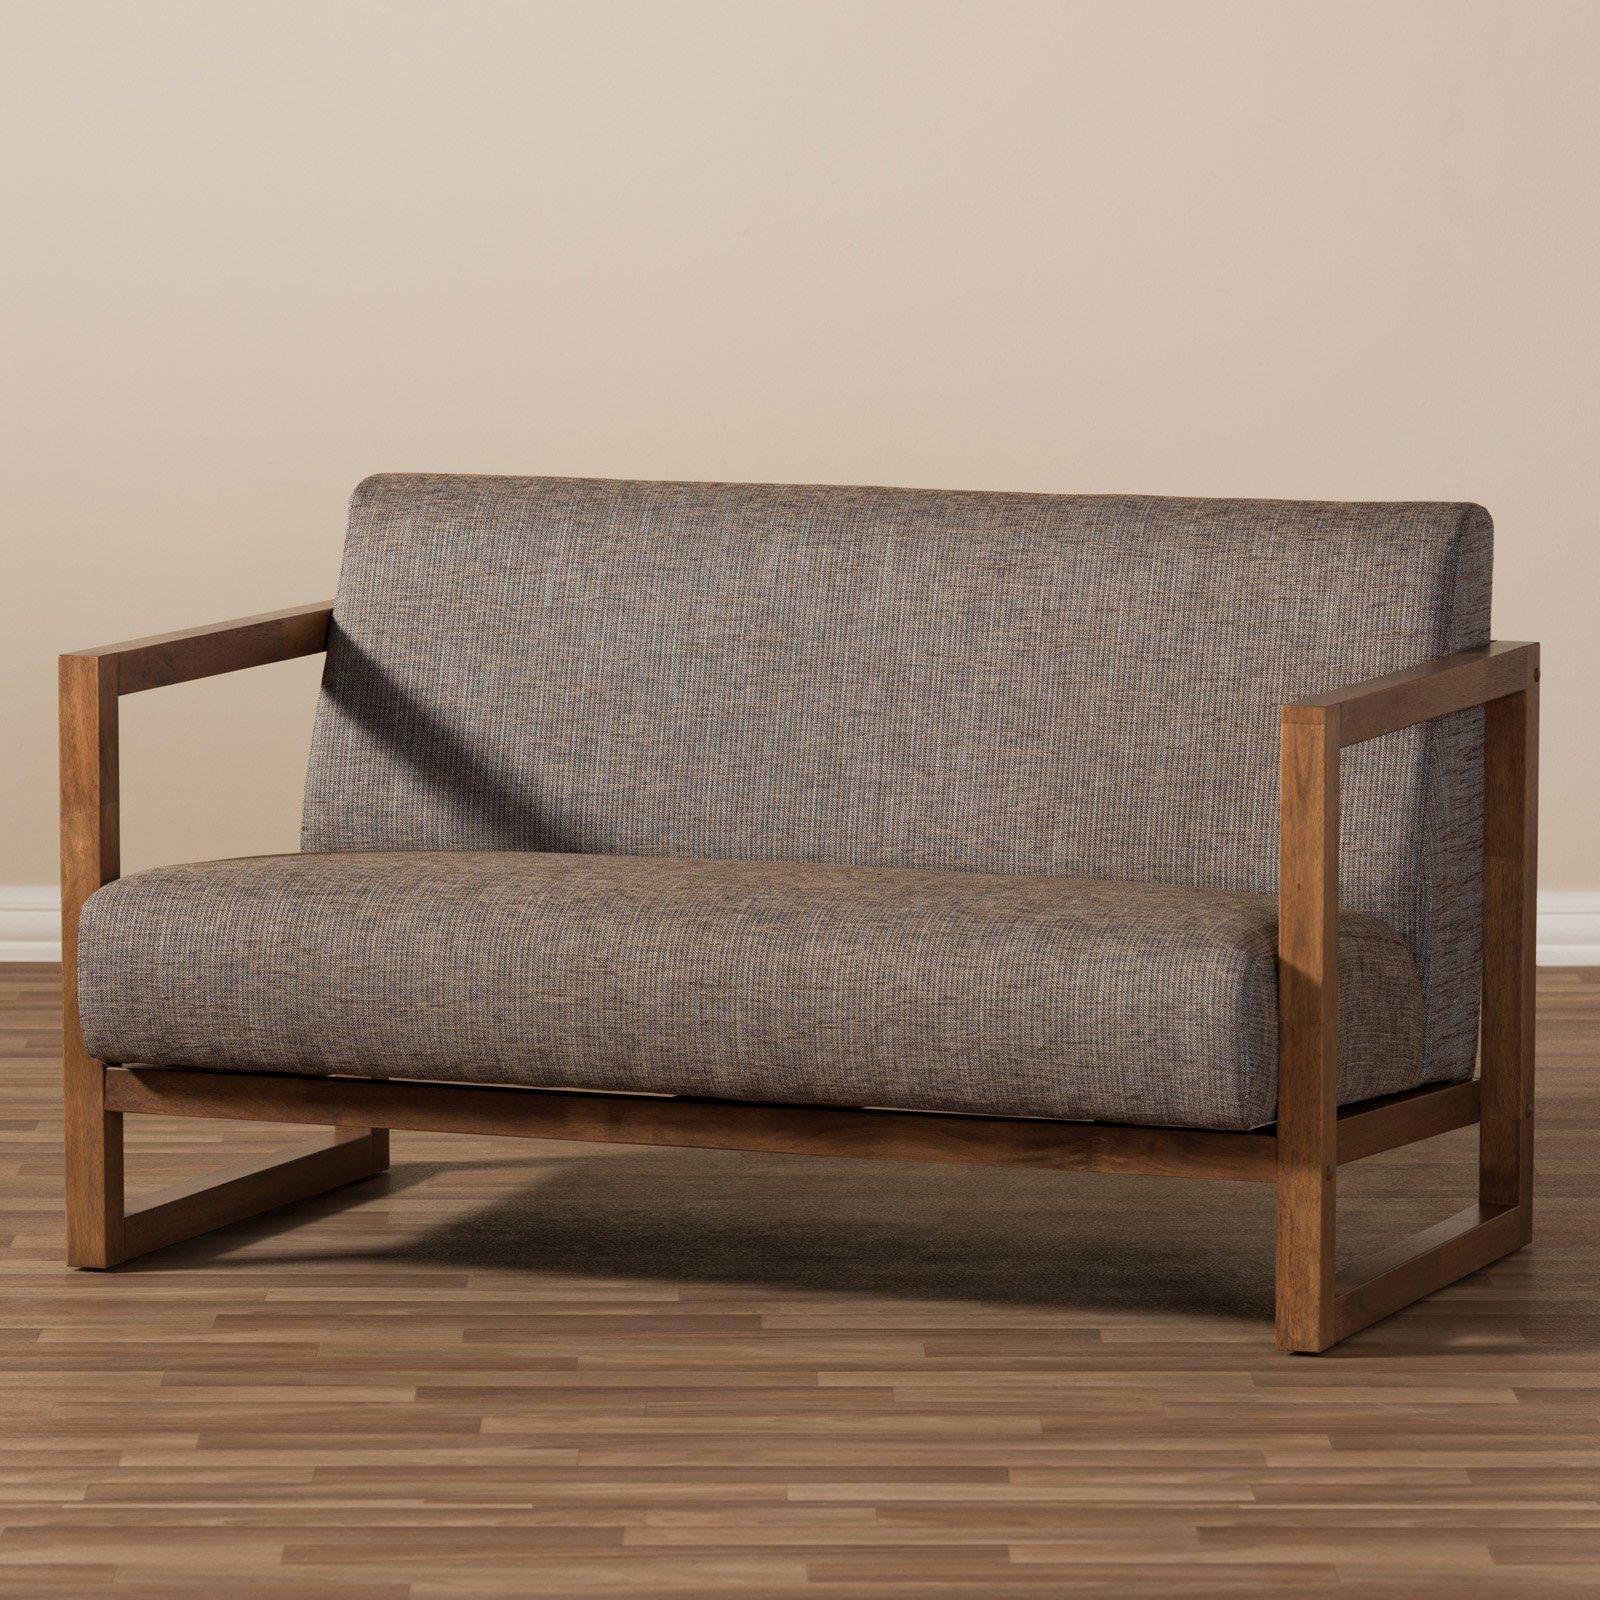 Baxton Studio Valencia Mid-Century Modern Walnut Finish Gravel Fabric Upholstered Loveseat